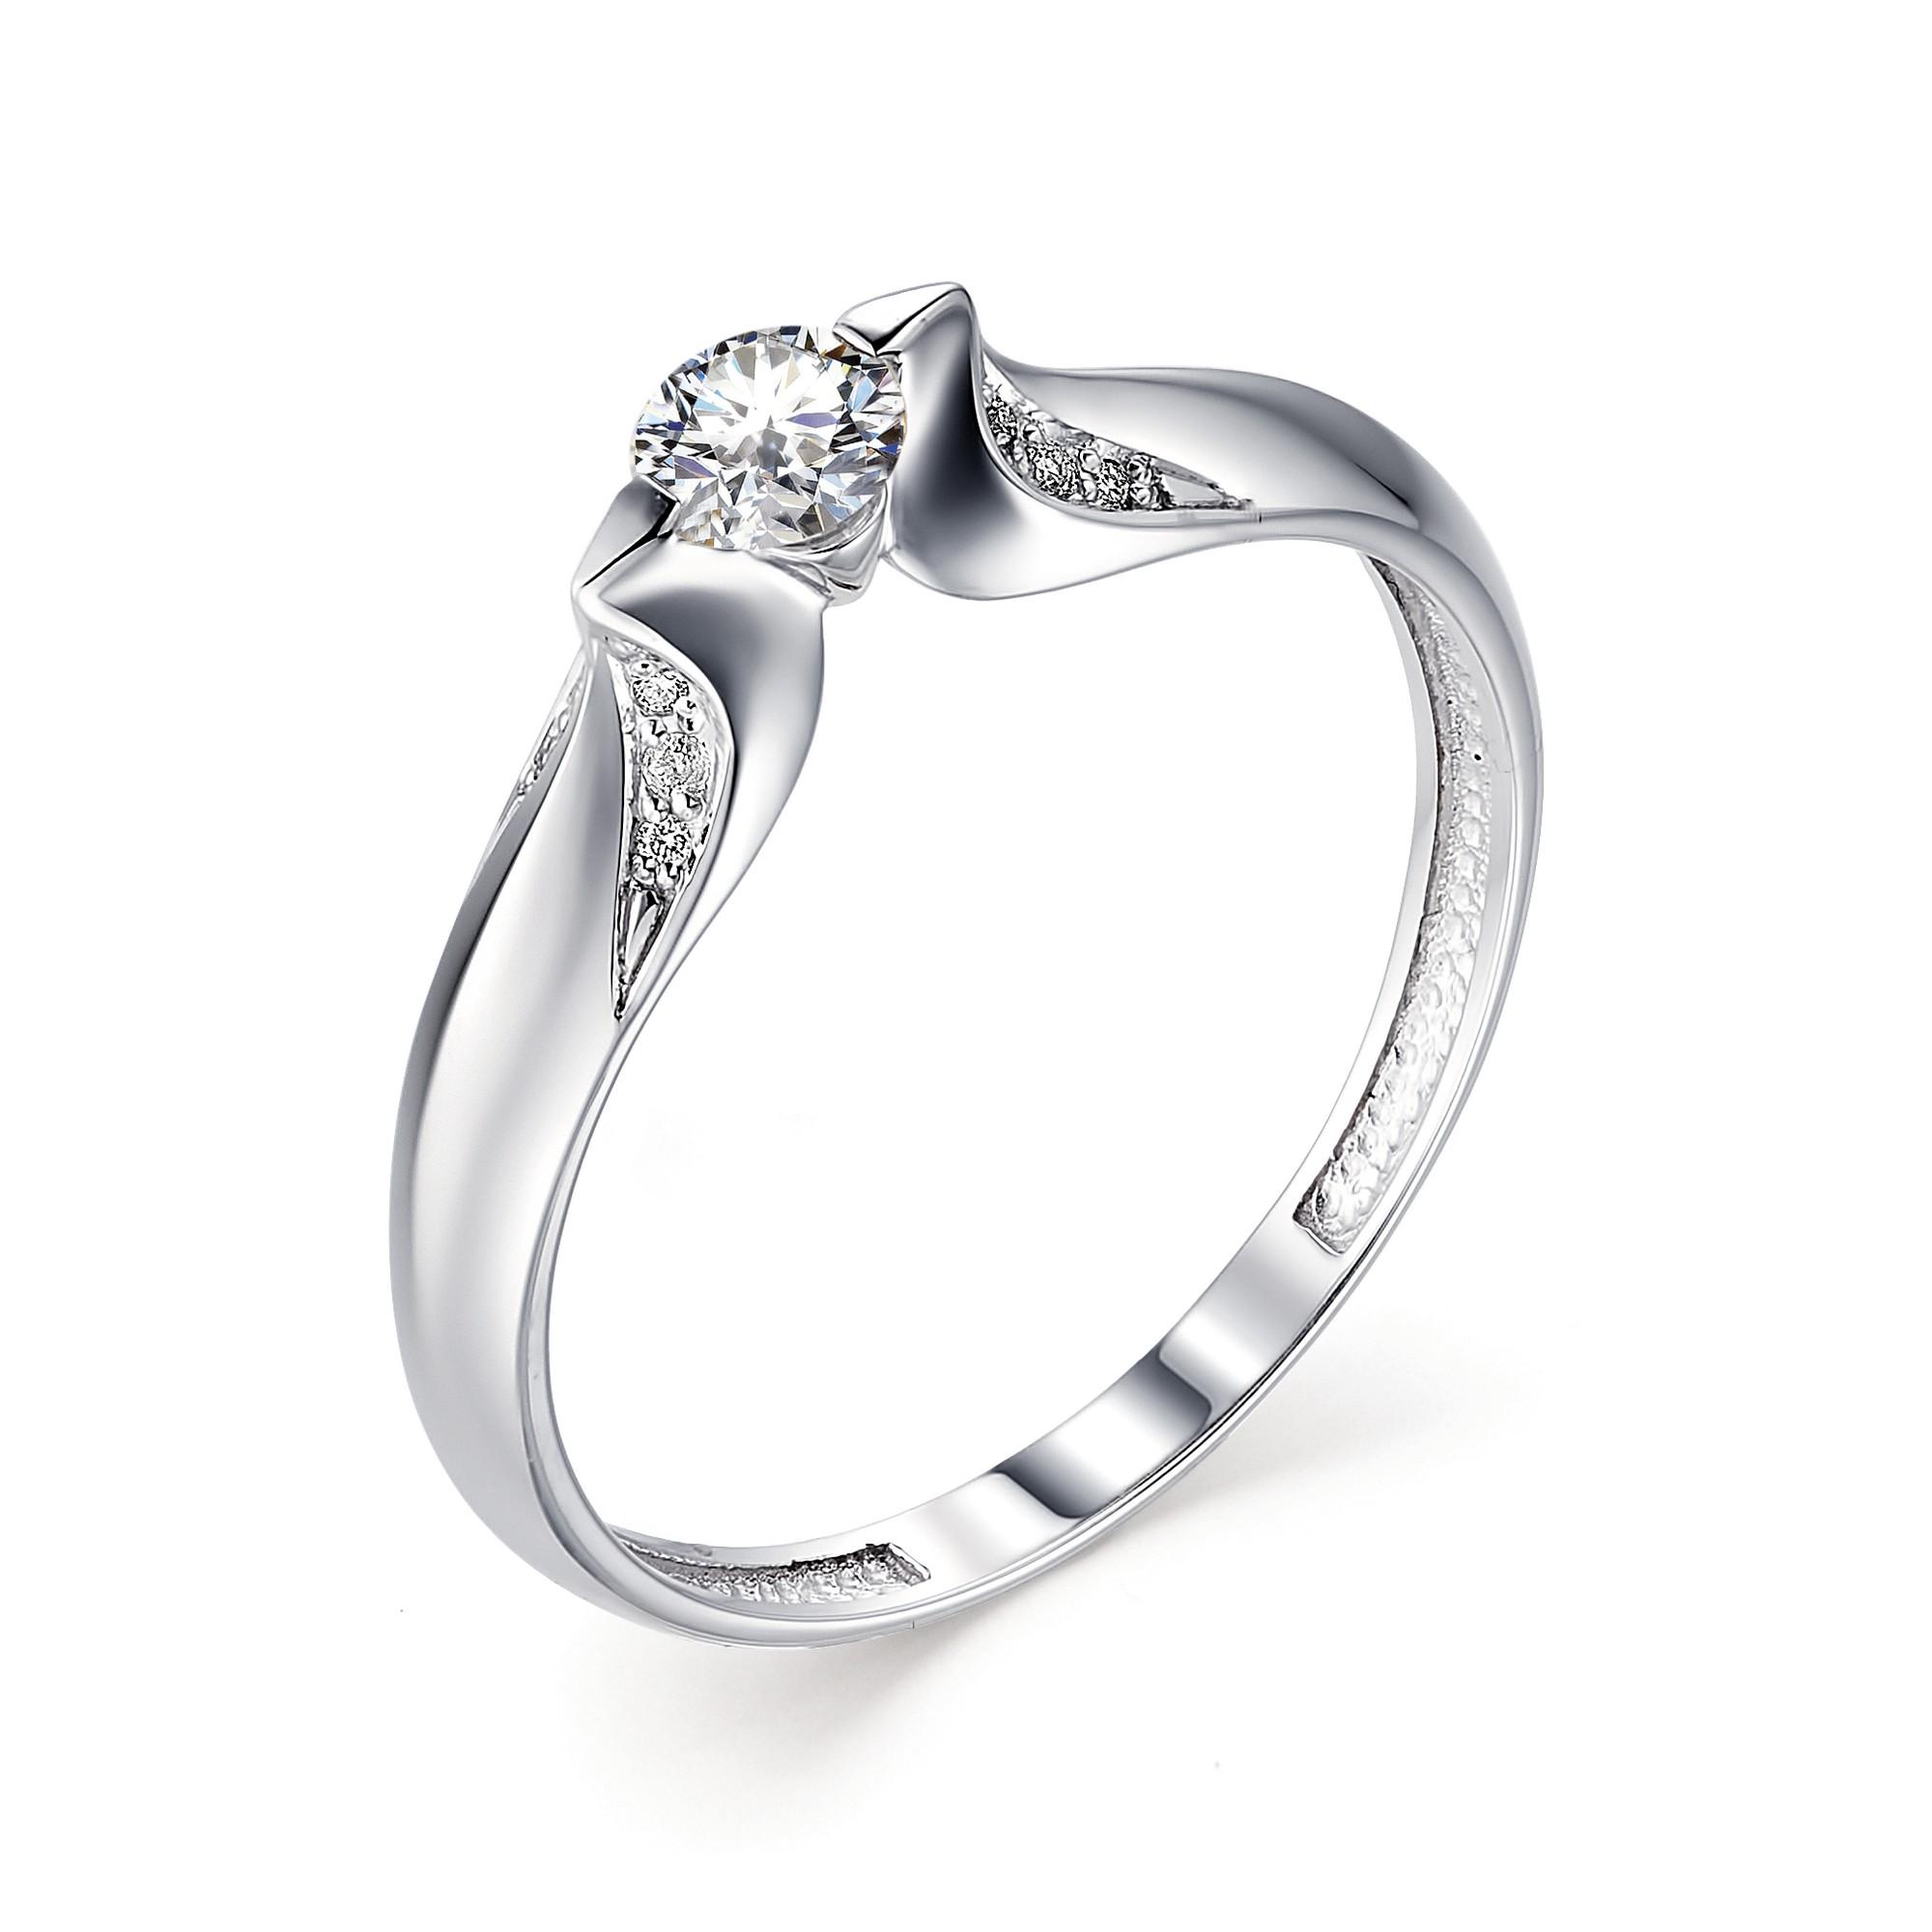 картинка кольцо 12673-200 1 бриллиант круг 57 0,238 4-5 3/7а, 12 бриллиант круг 57 0,029 200-400 3/6а 12673-200